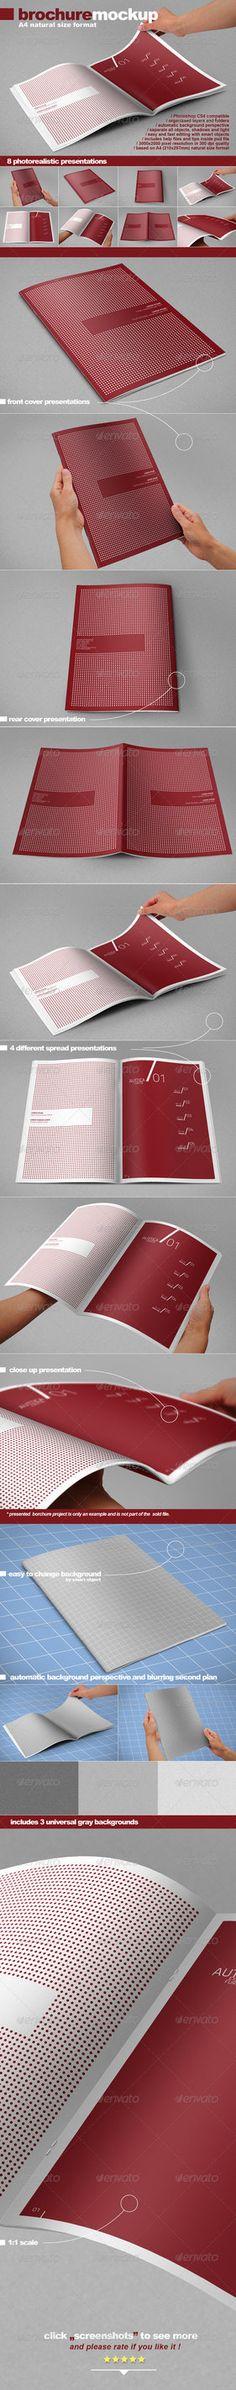 Photorealistic A4 Brochure Mock-up by GraphicAssets.deviantart.com on @DeviantArt